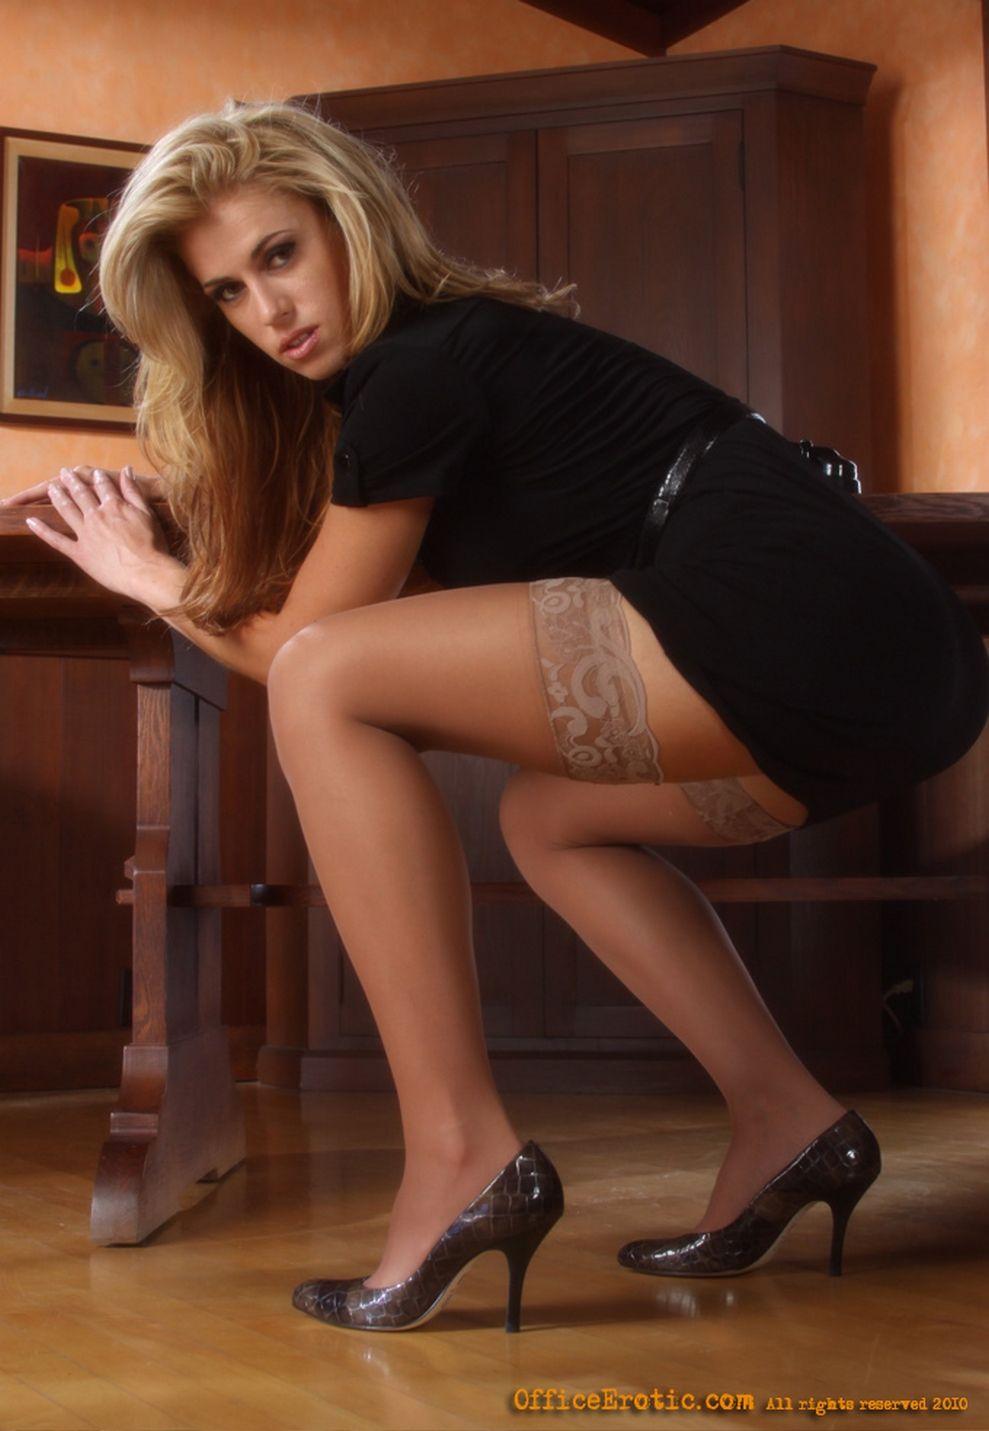 Randy Moore  Fine Women  Sexy Stockings, Stockings Legs -6779